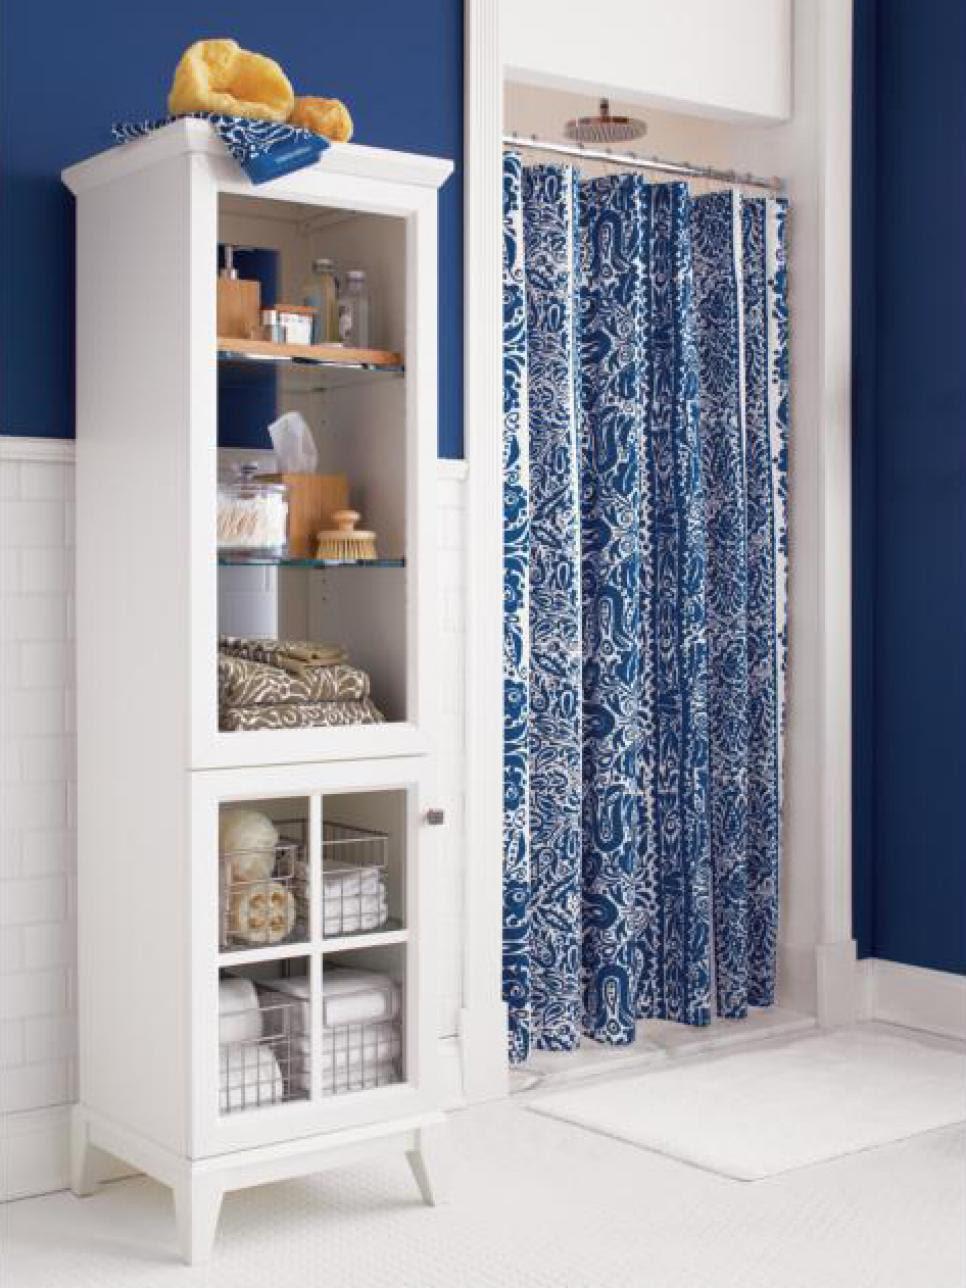 Shower Curtain Blues   HGTV